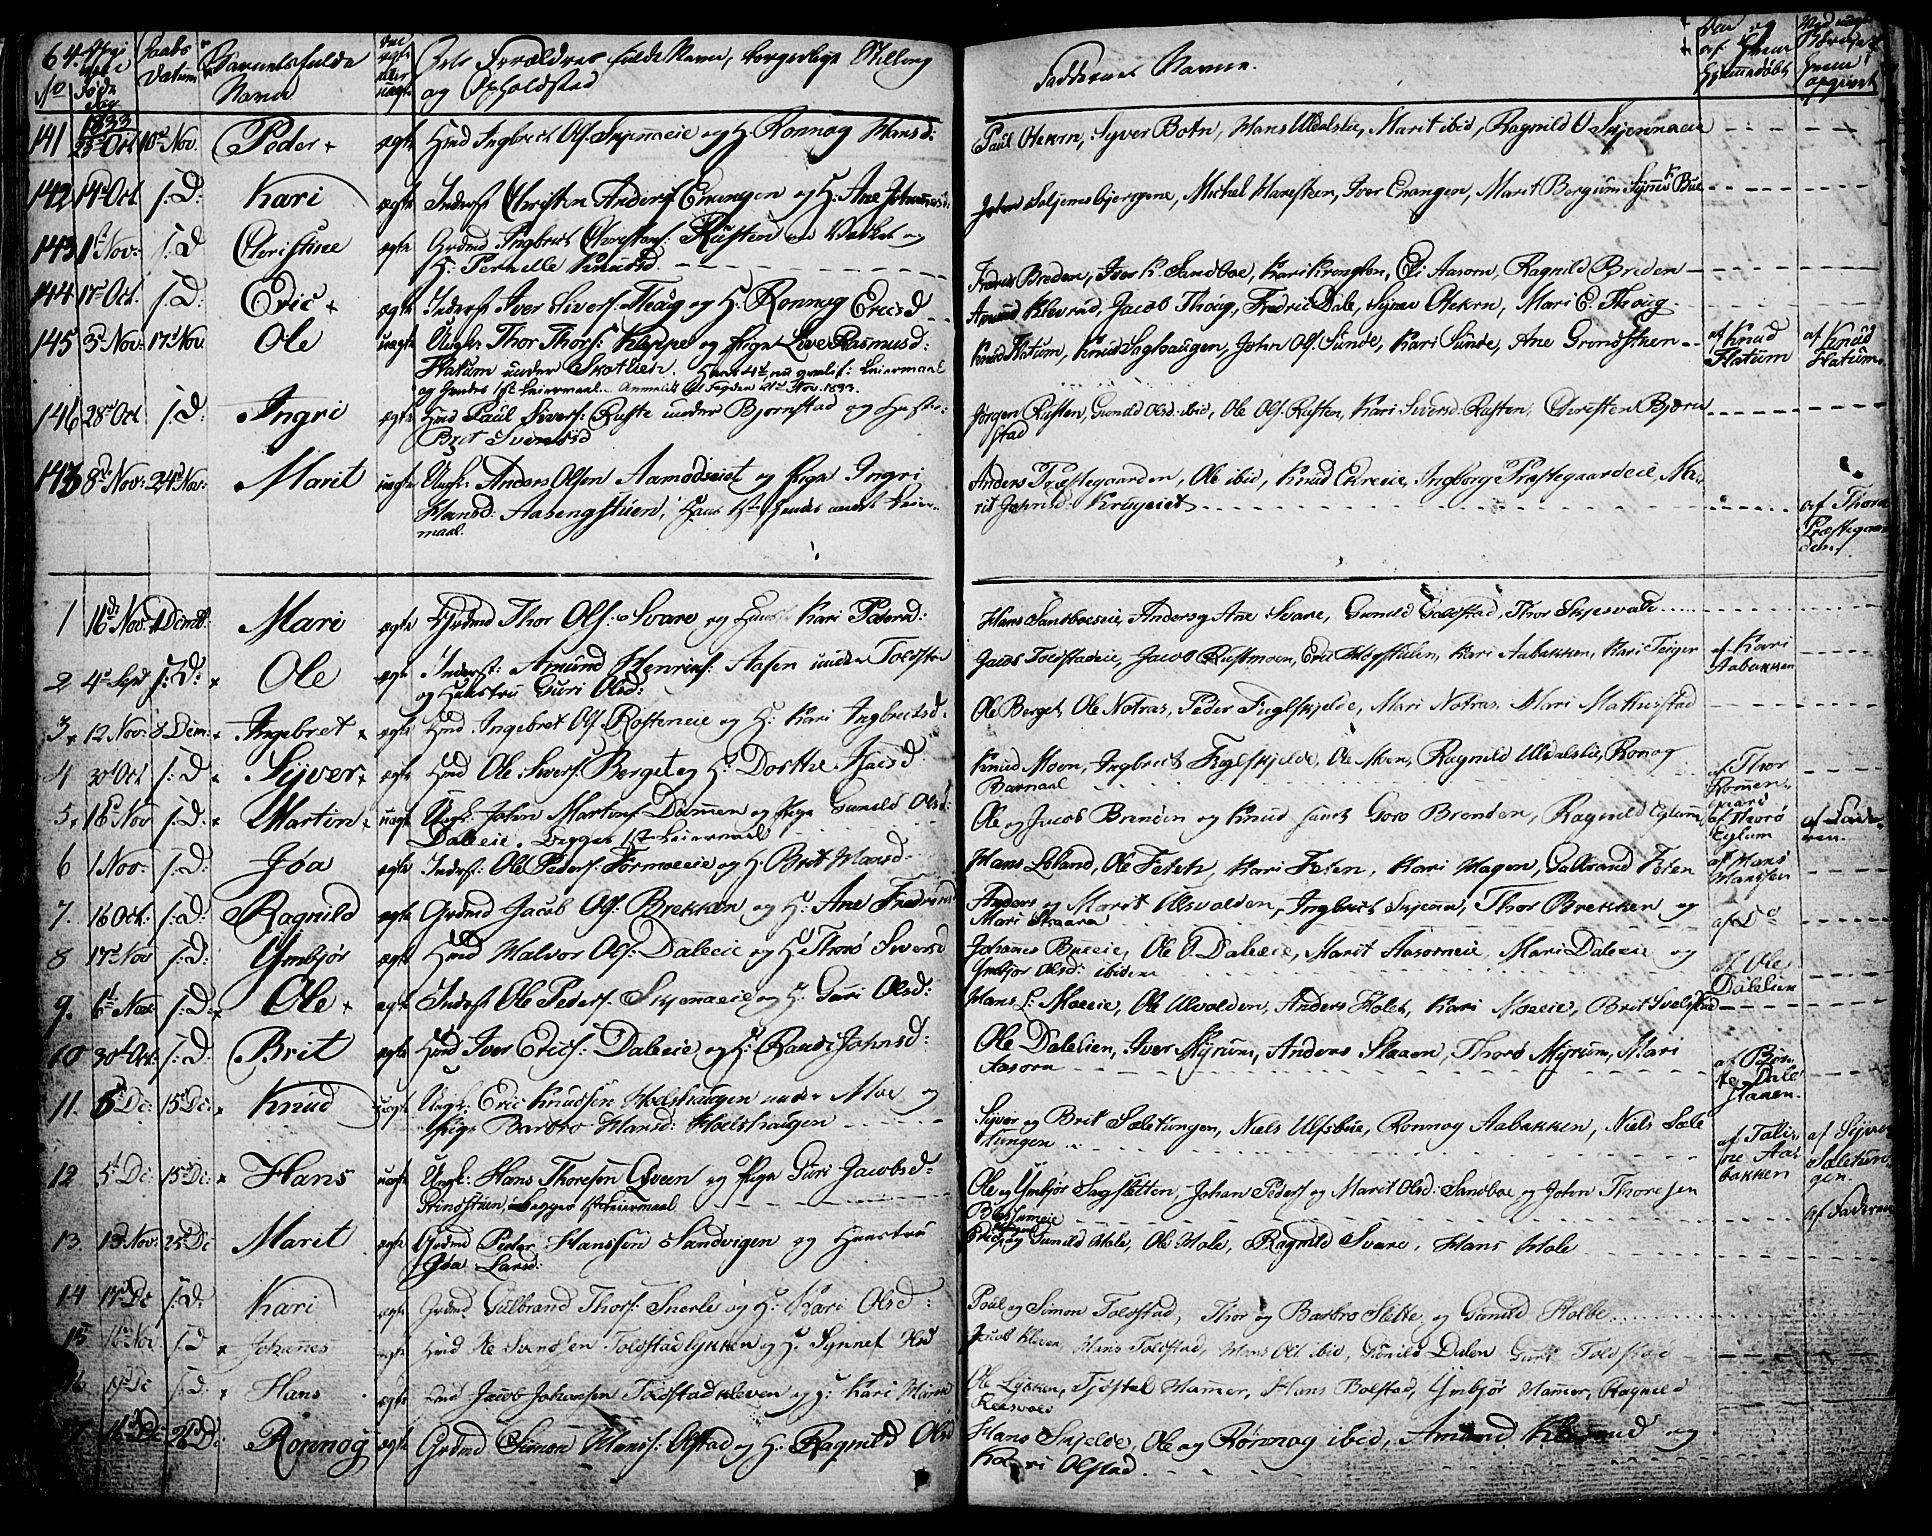 SAH, Vågå prestekontor, Ministerialbok nr. 4 /1, 1827-1842, s. 64